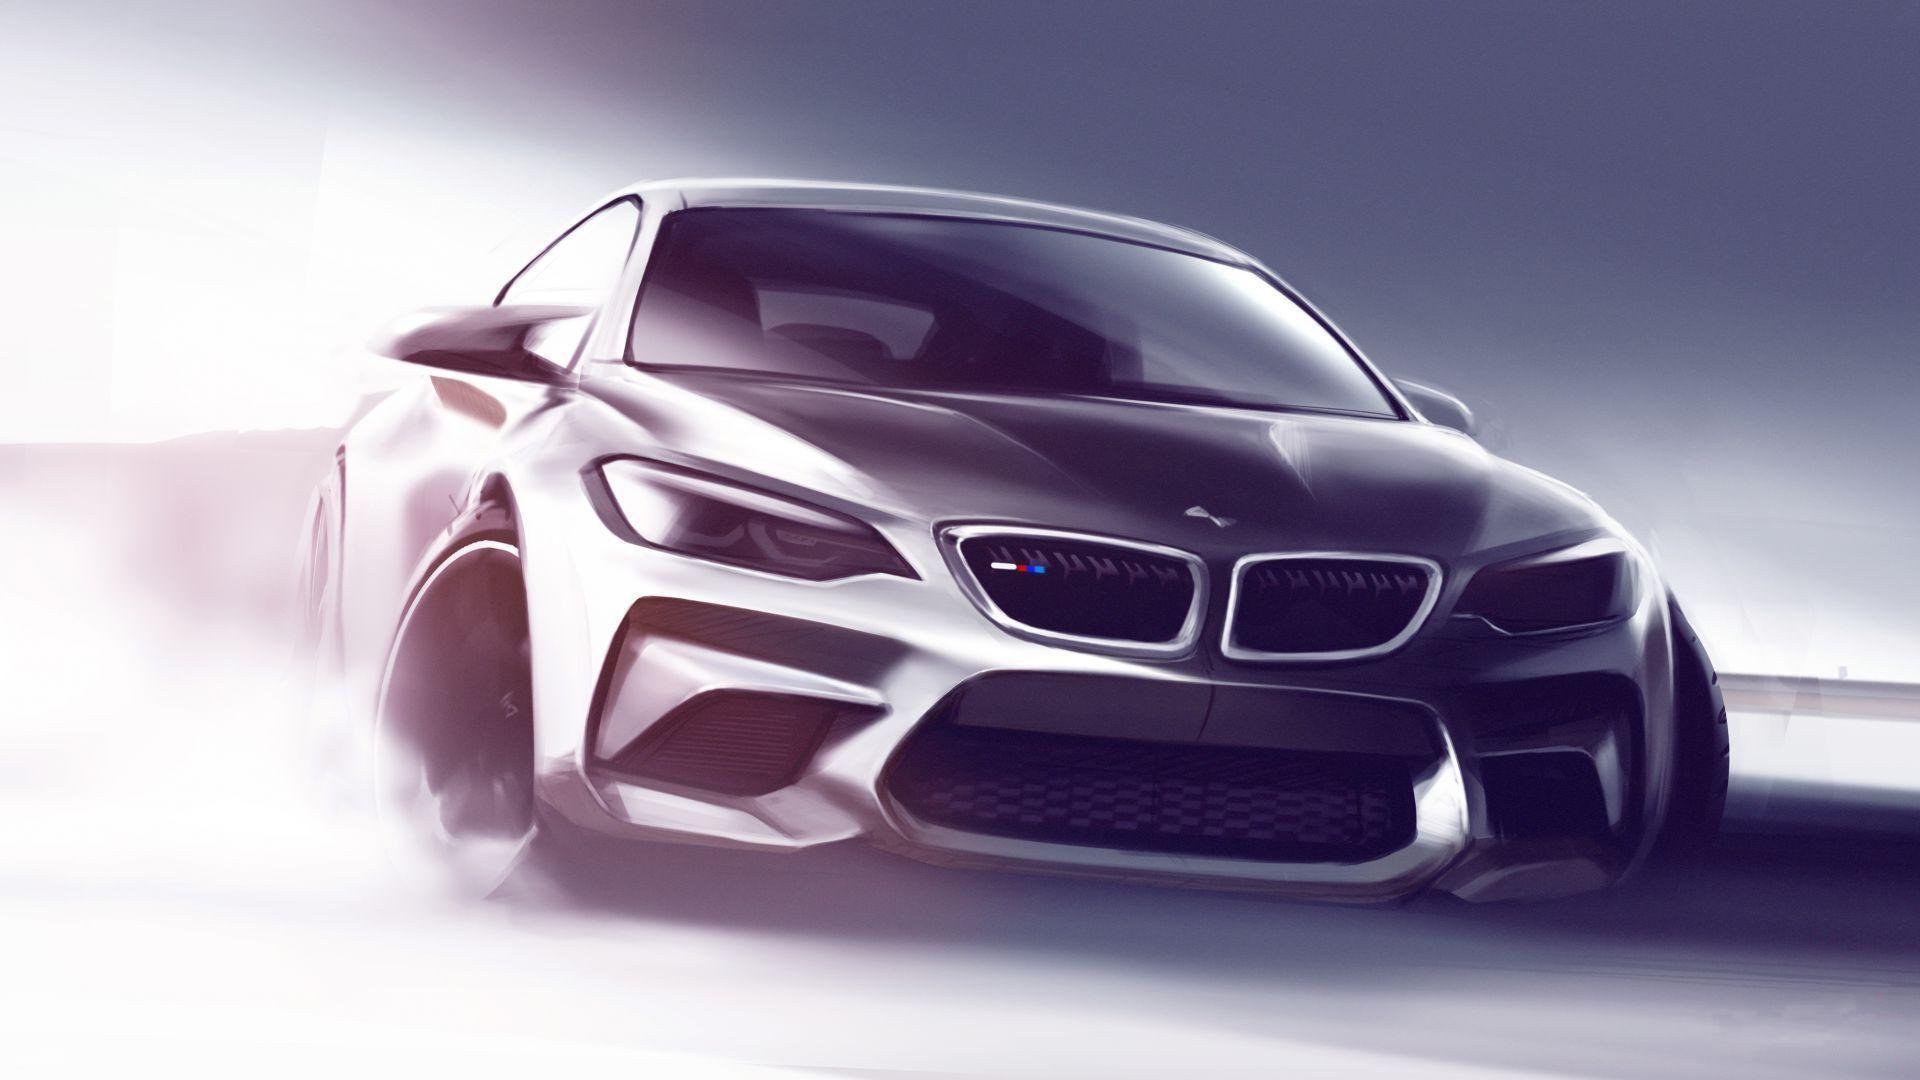 Wallpaper Drawing Concept Cars Sports Car Performance Car Bmw